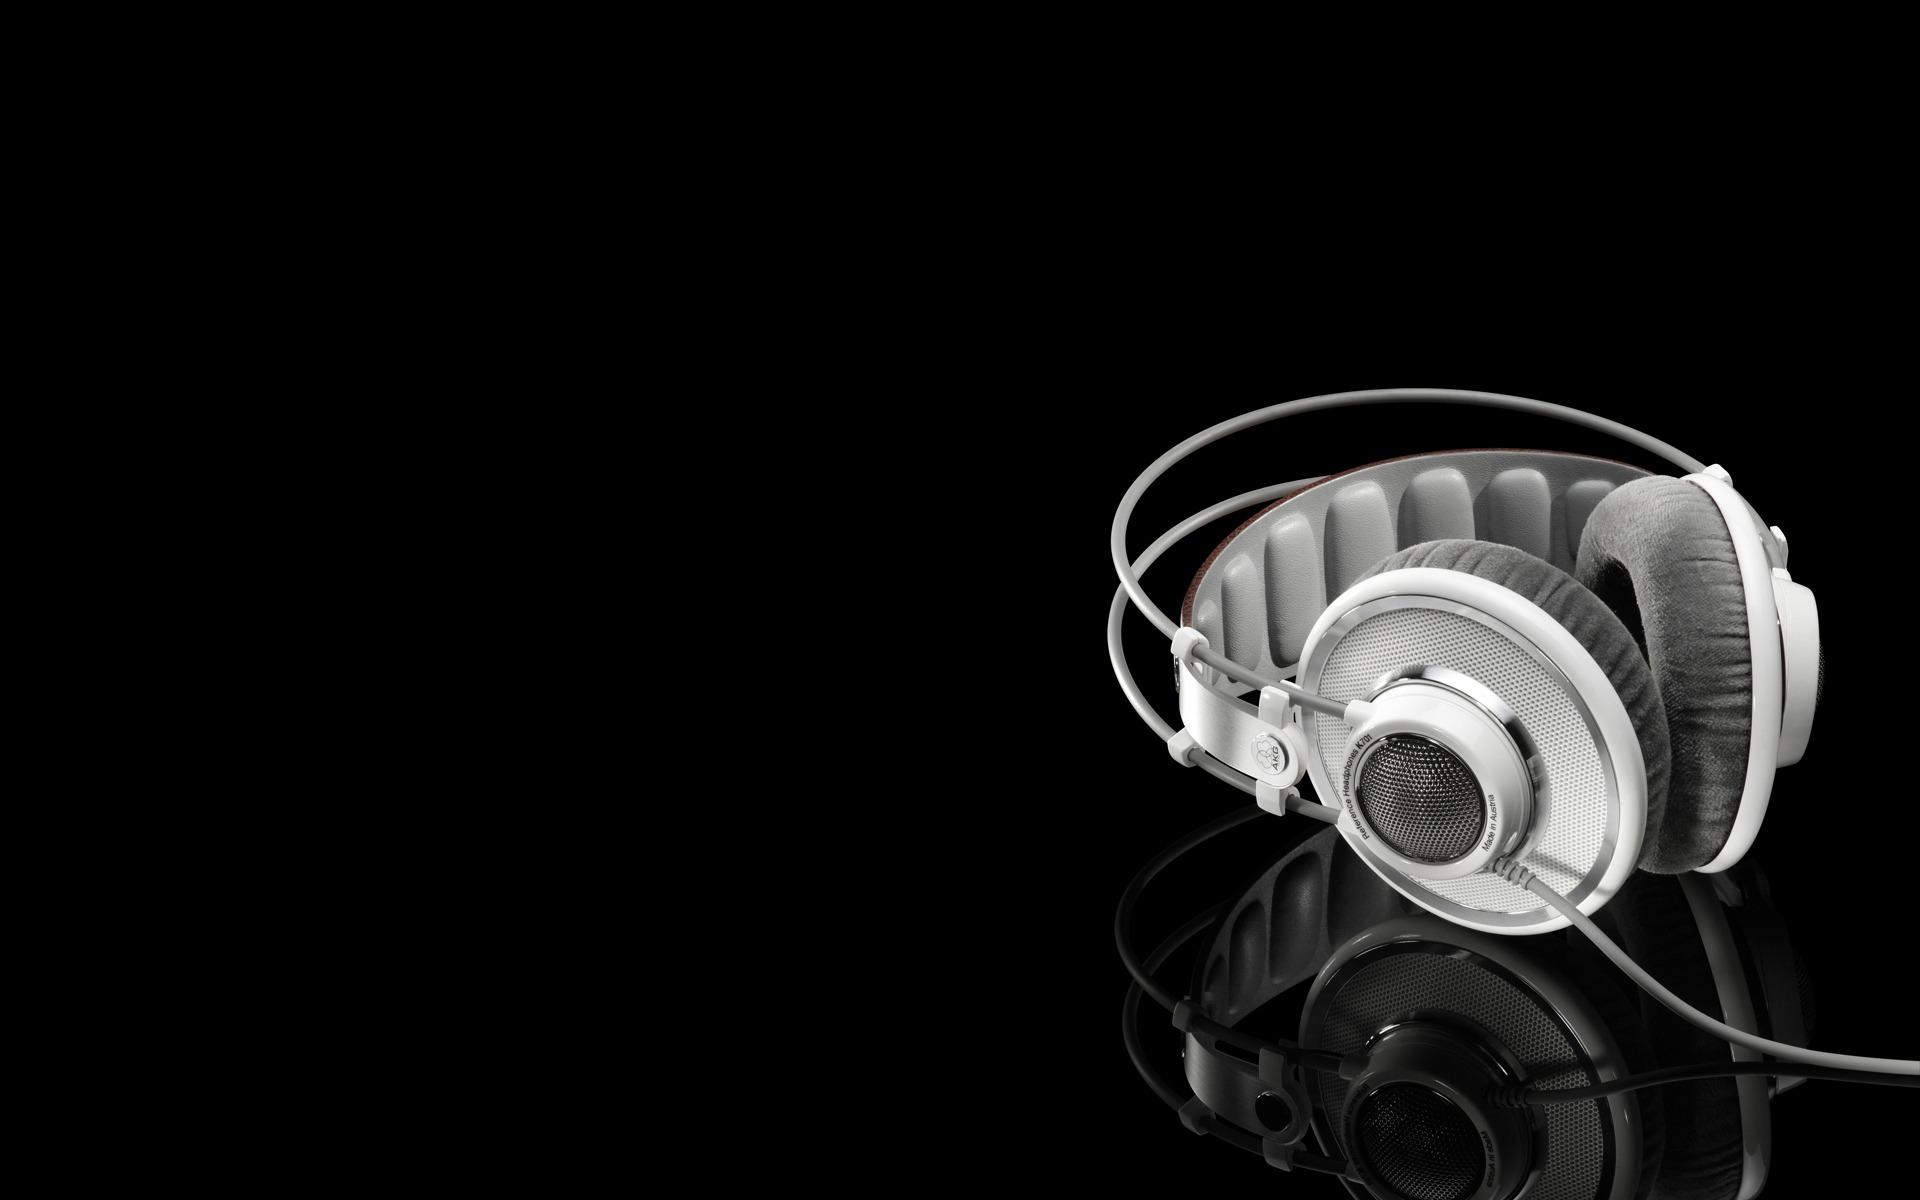 Headphone Wallpaper